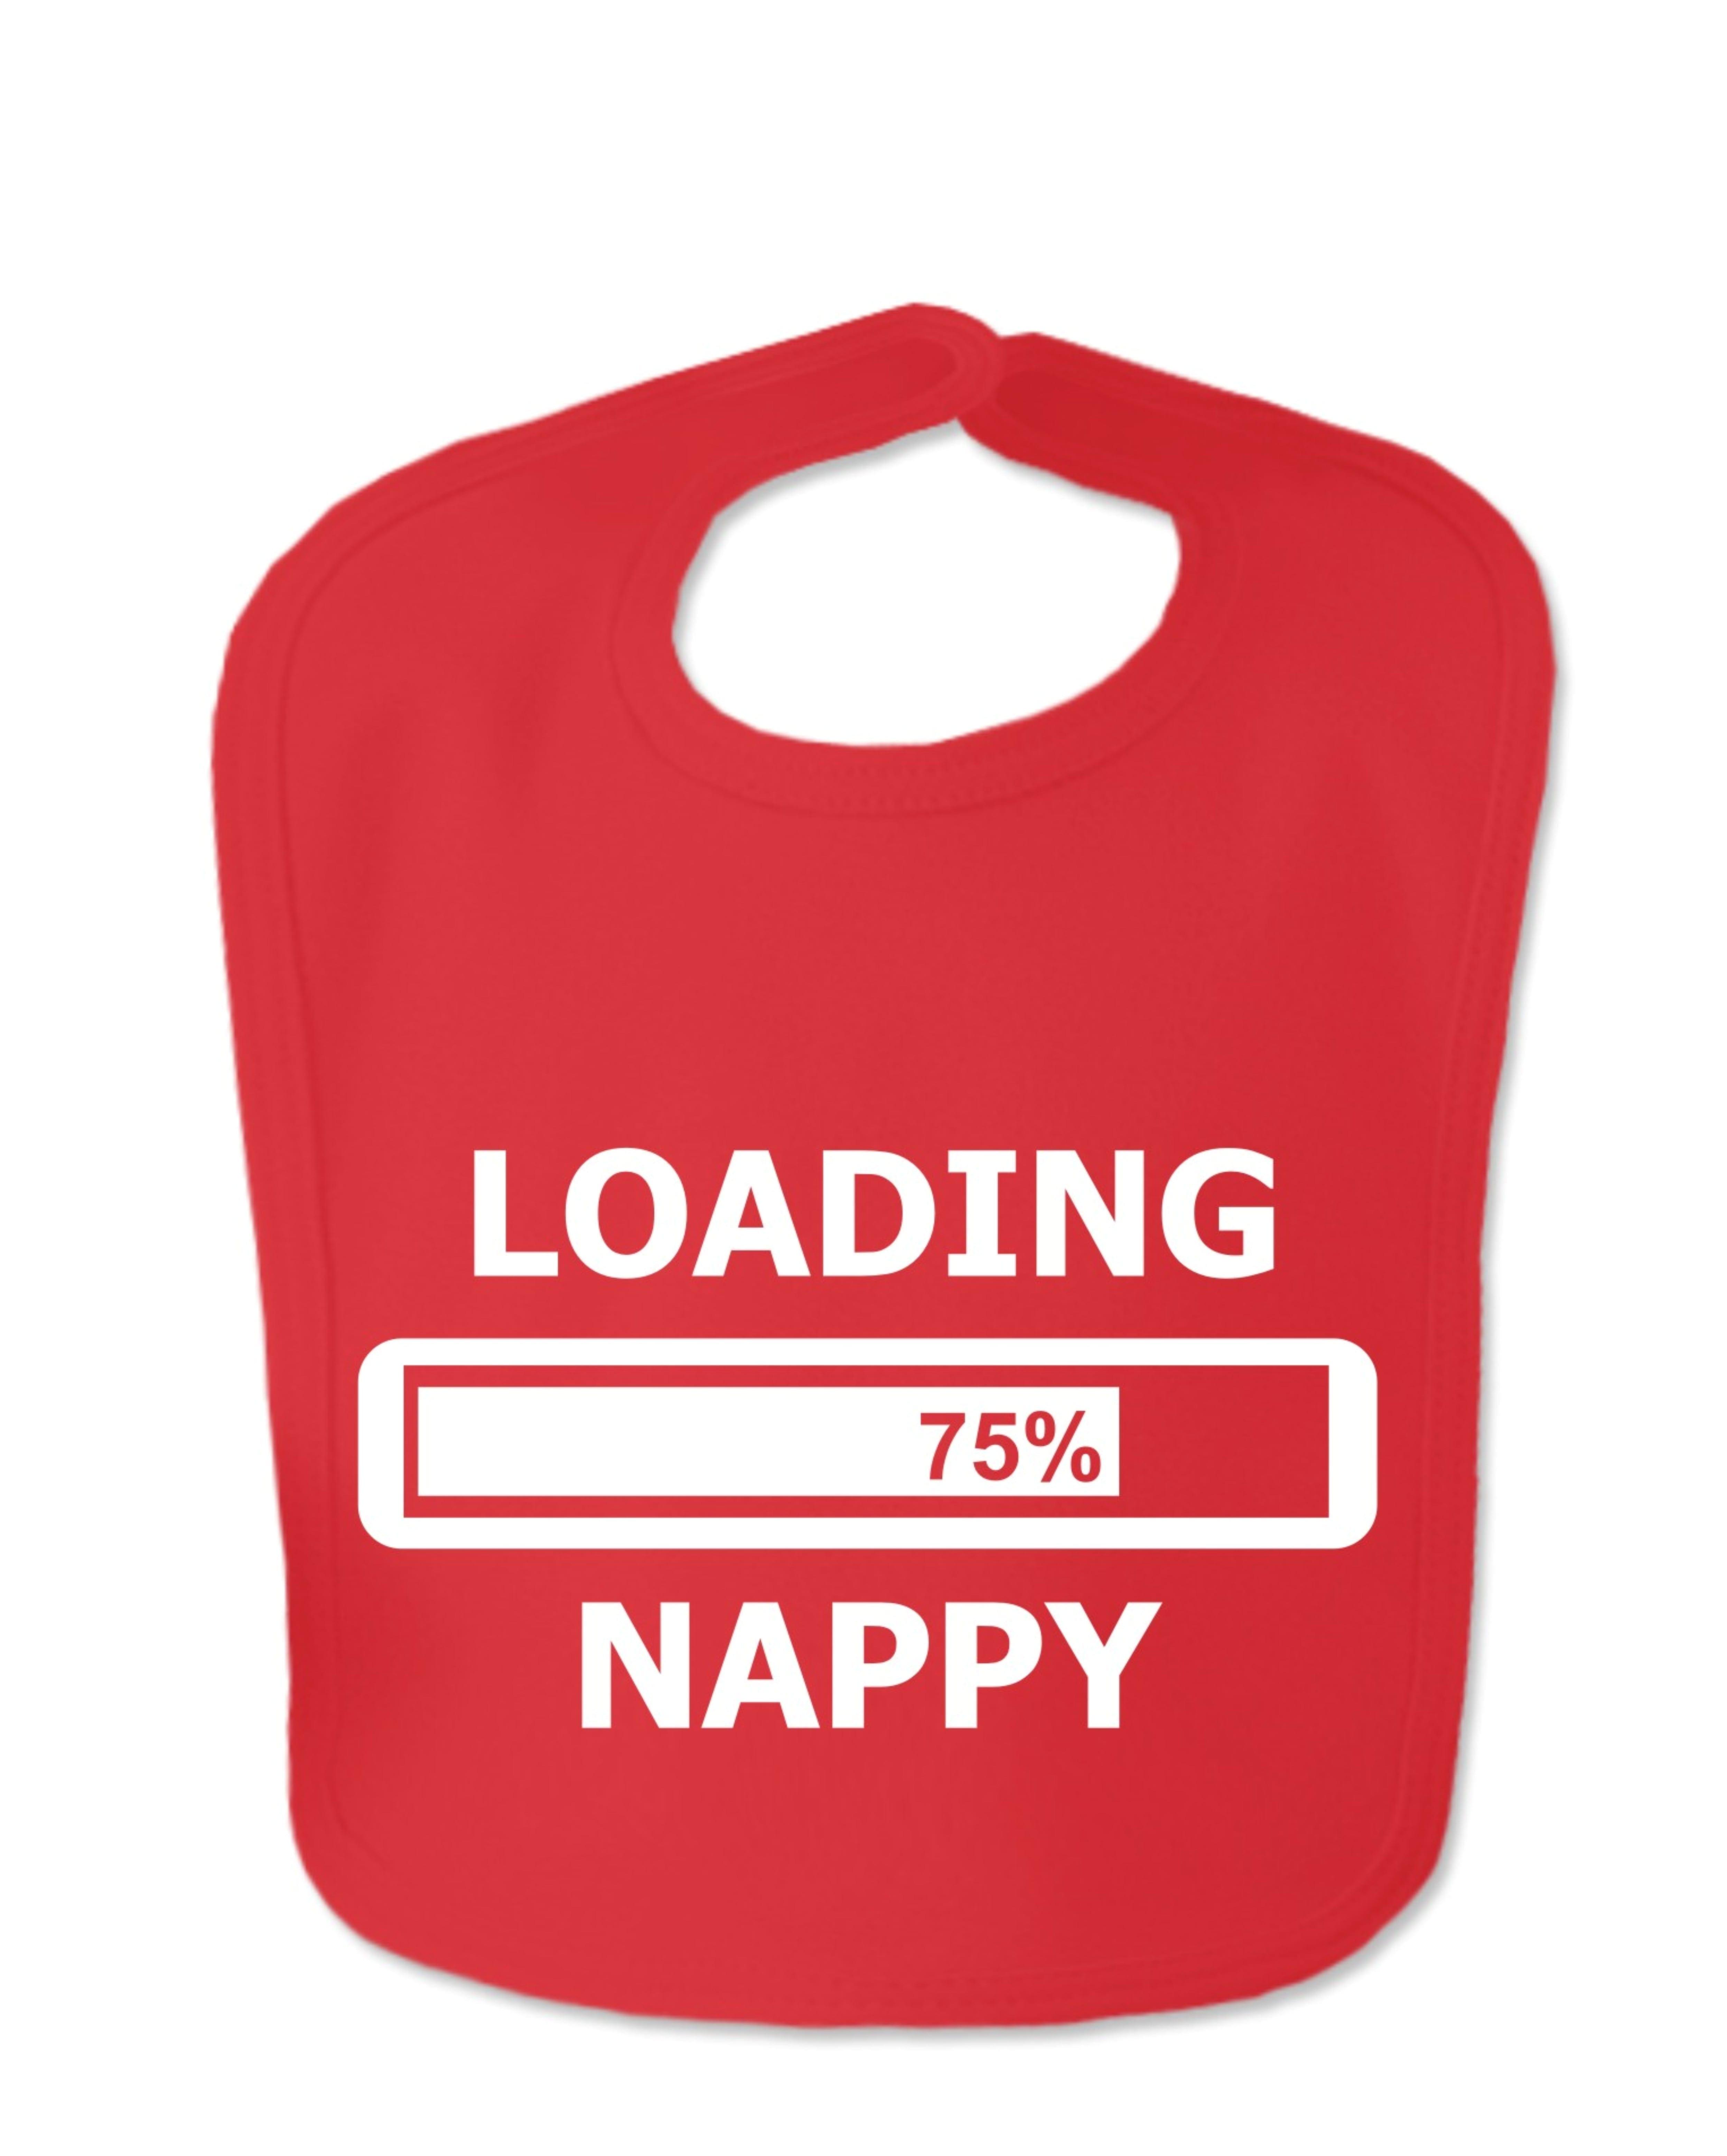 Red Loading Nappy Velcro Bib